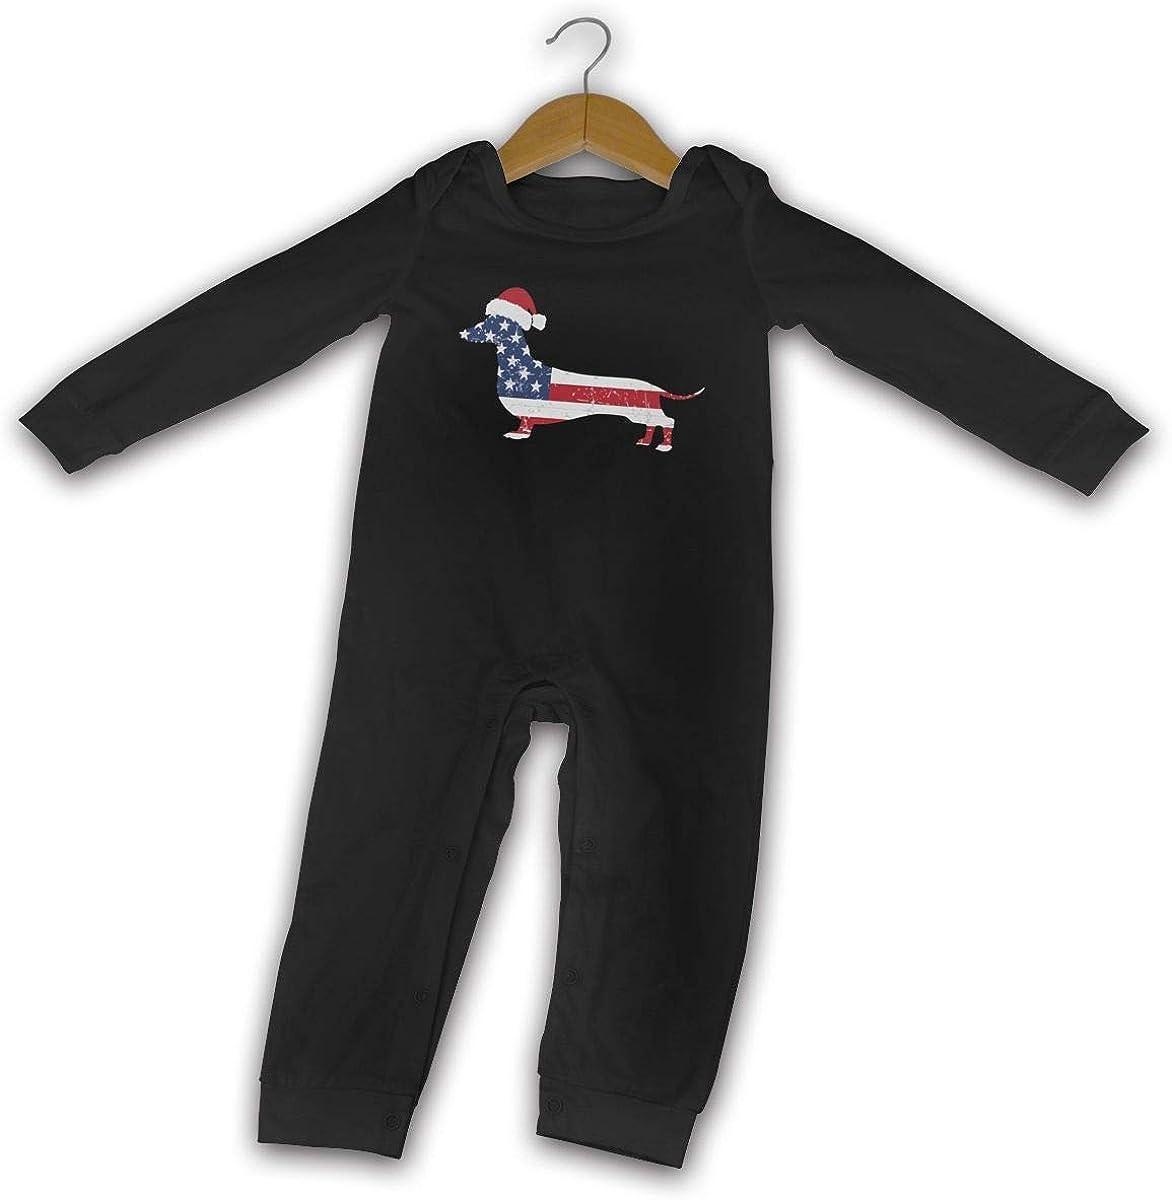 GOOD BBBaby Infant Baby Boy Girl Printed American Flag Dachshund Bodysuit Romper Jumpsuit 519xUUdLCHL